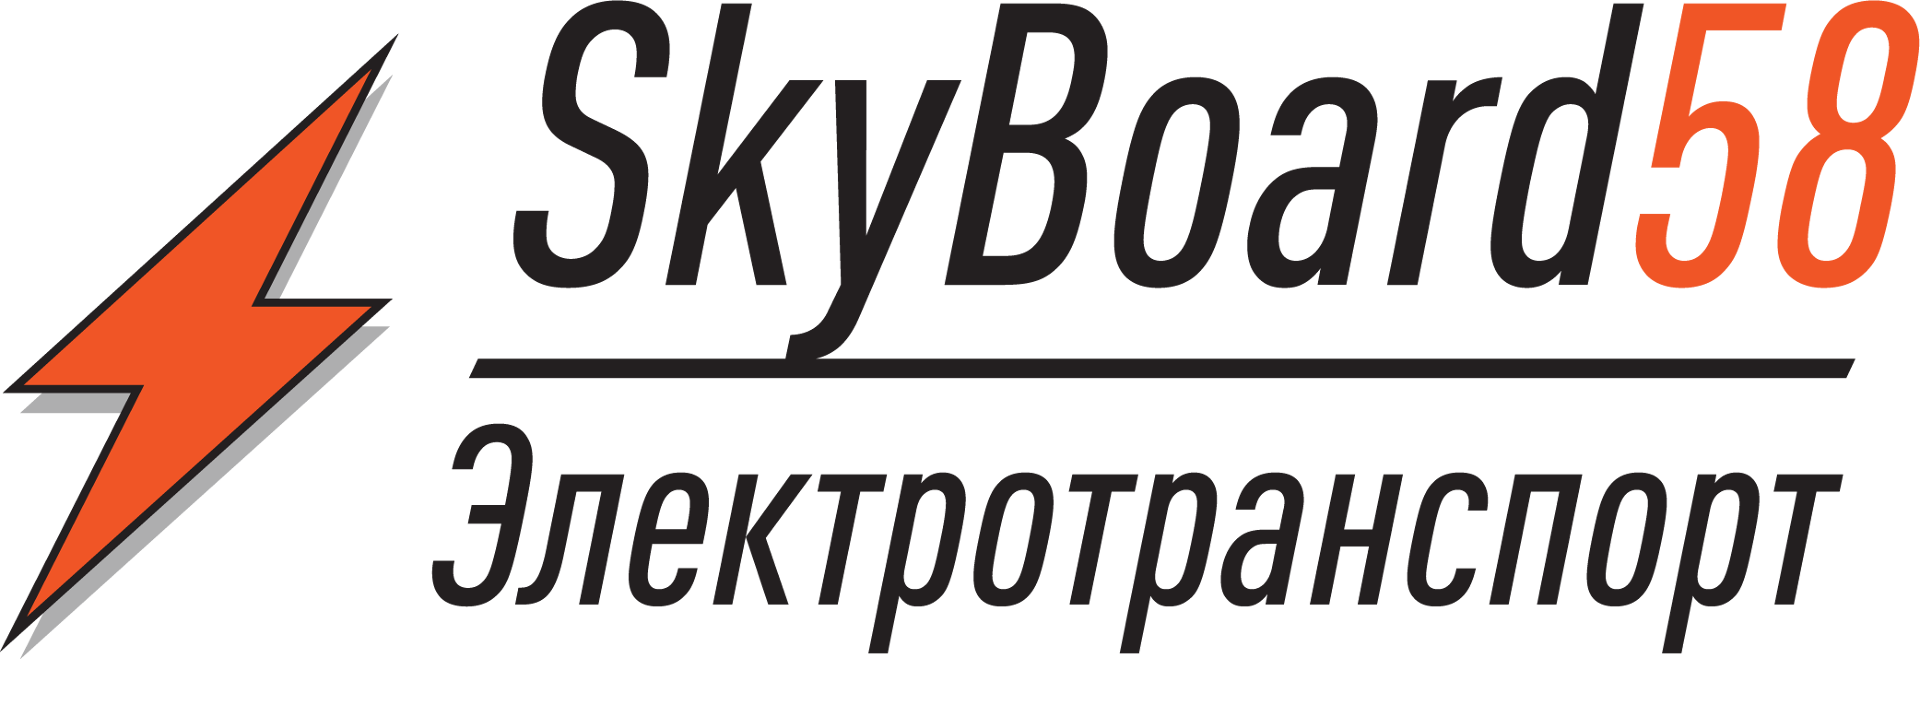 SkyBoard58